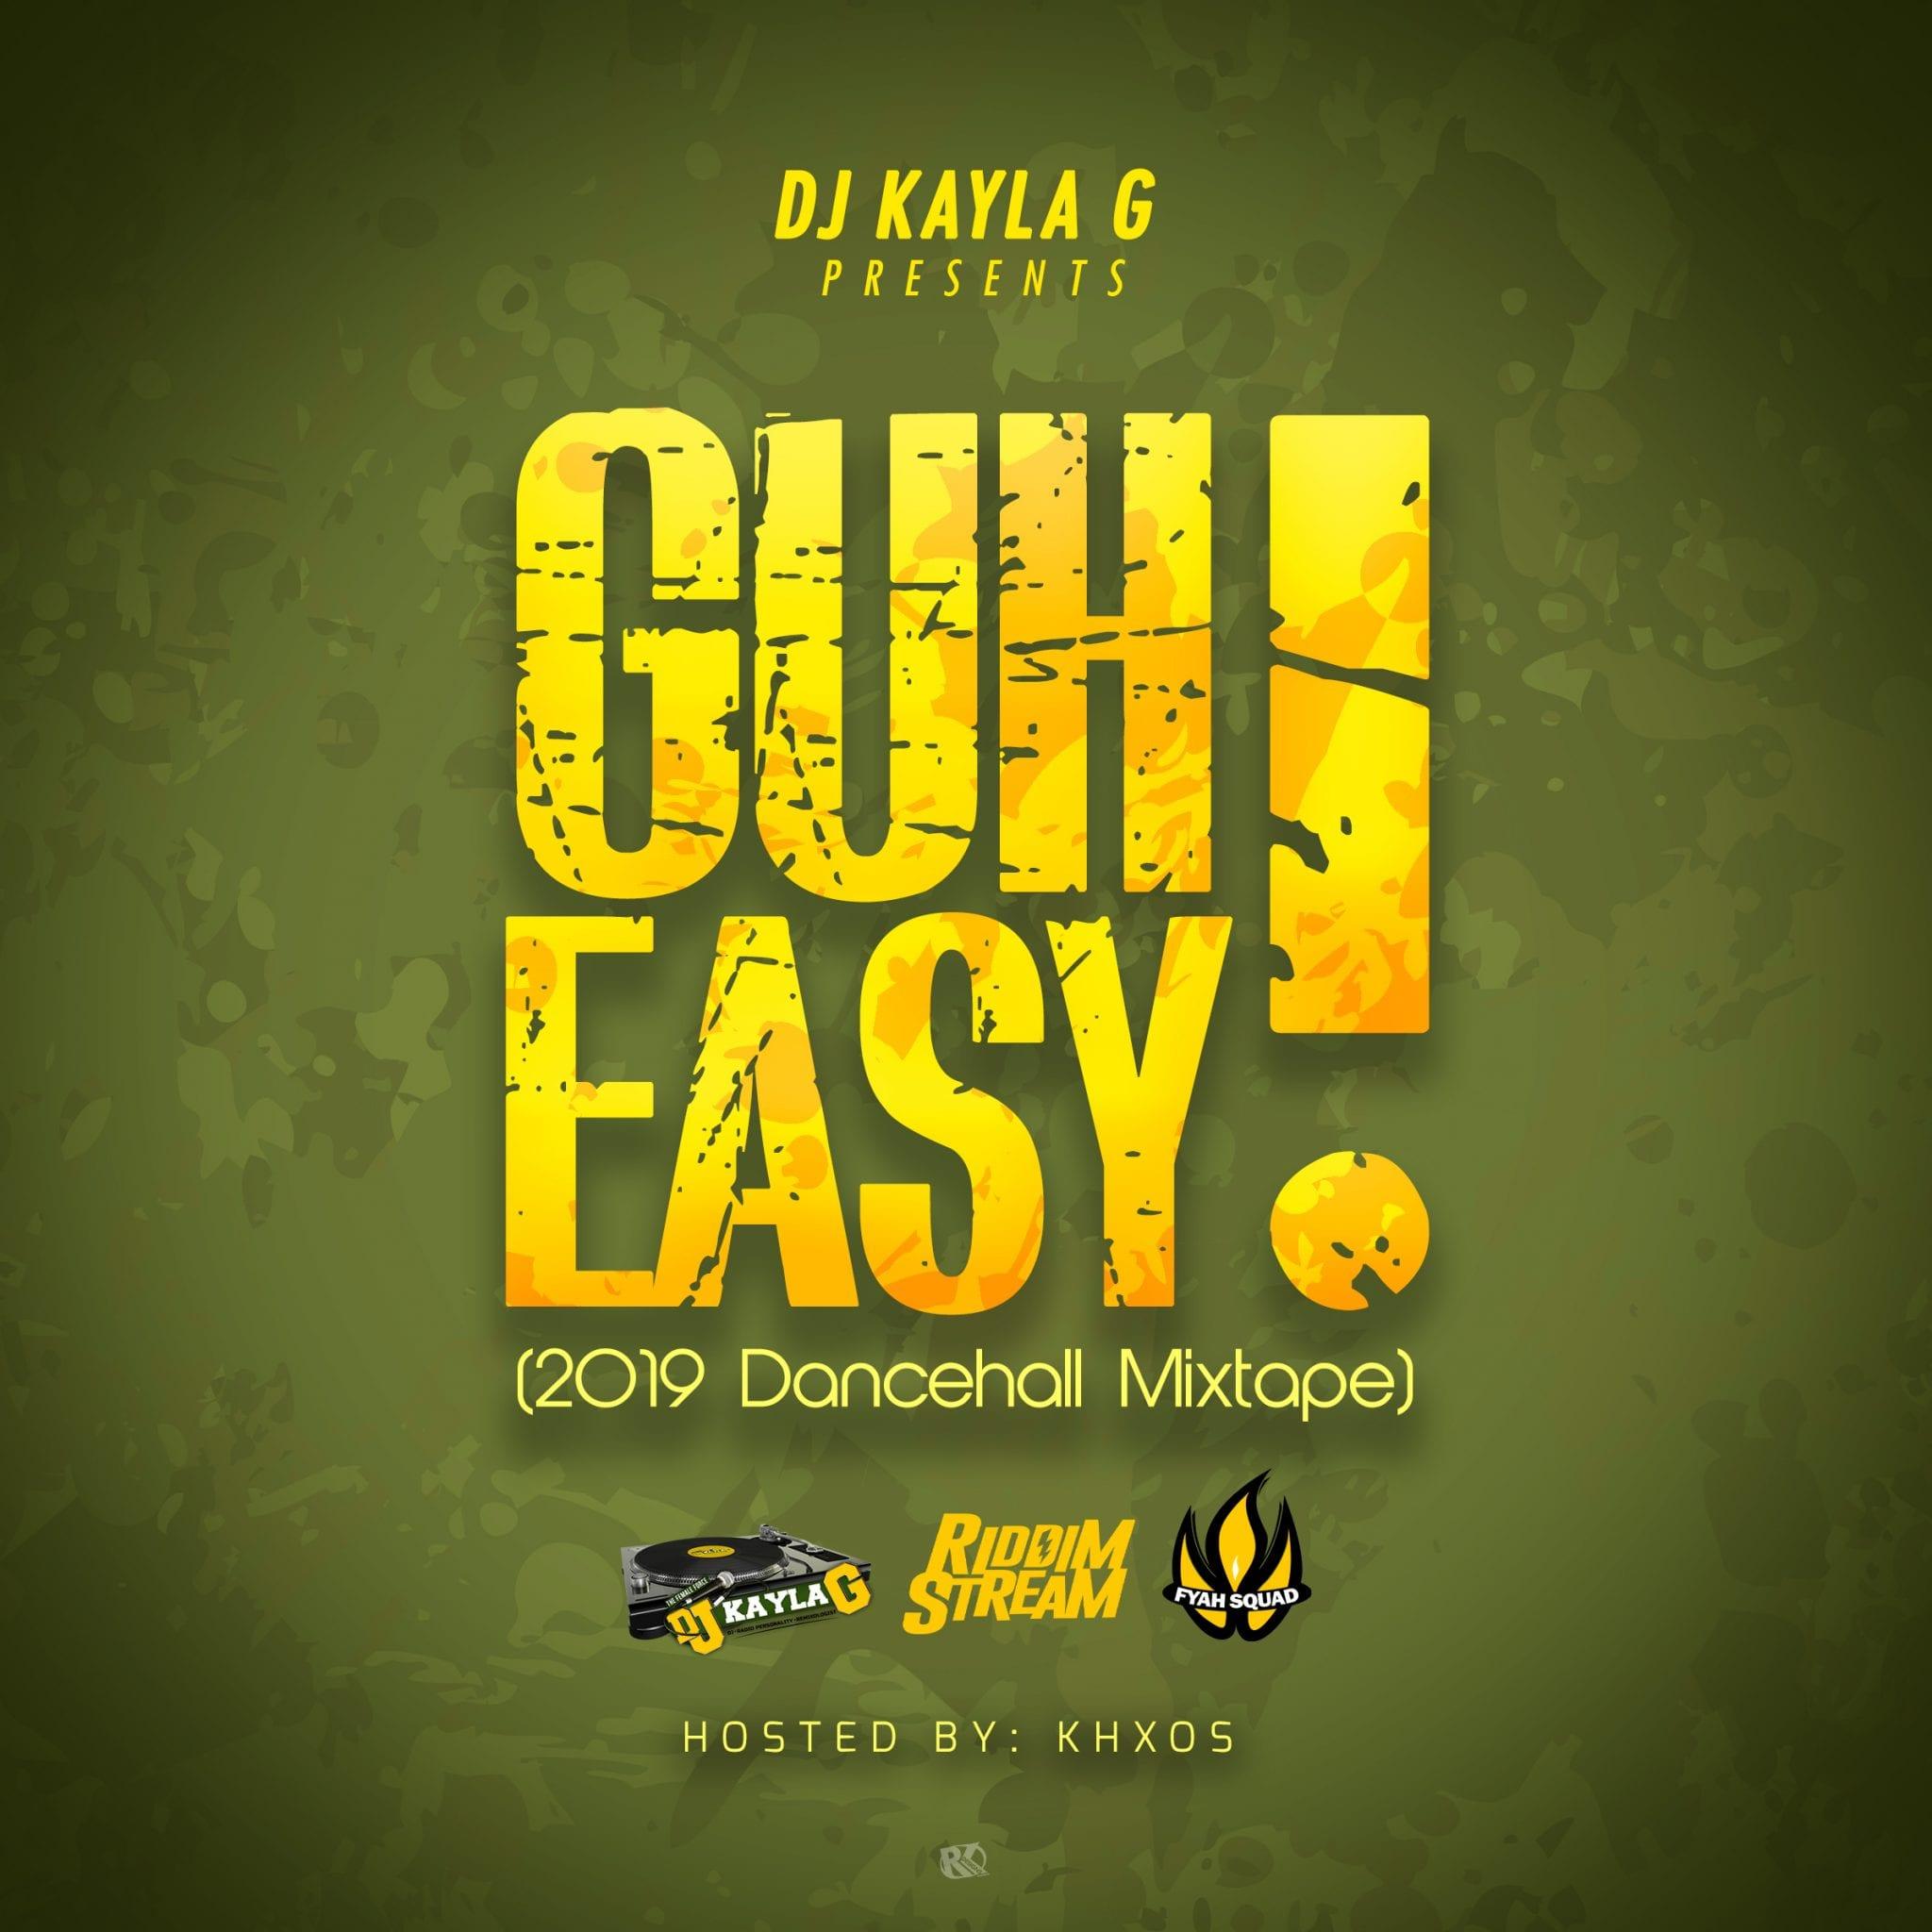 DJ Kayla G - Guh Easy (2019 Dancehall Mixtape)